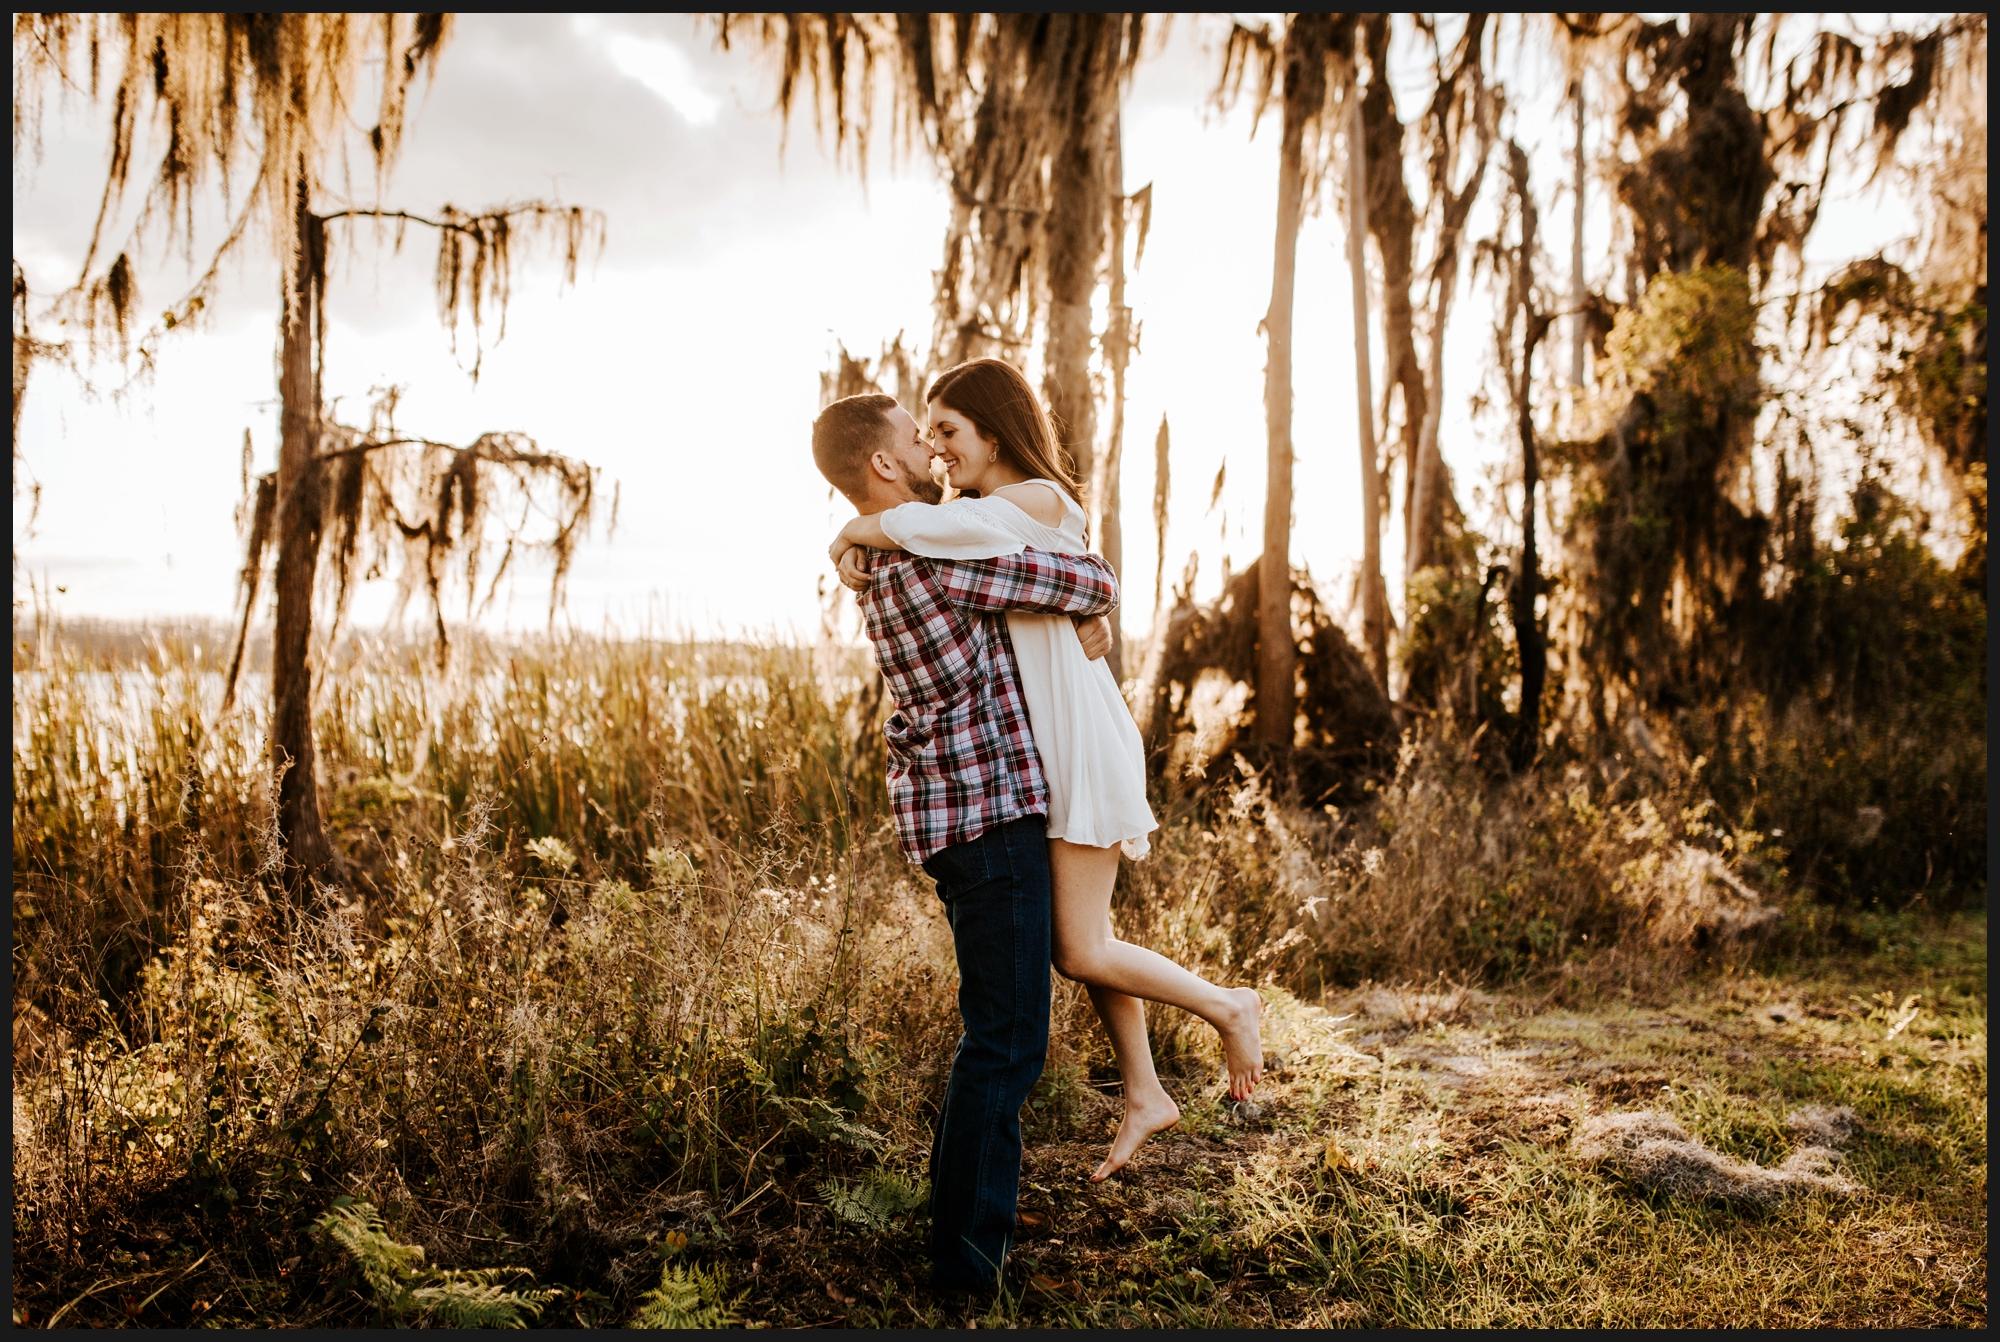 OrlandoWeddingPhotographerAnamariaSean_0021.jpg